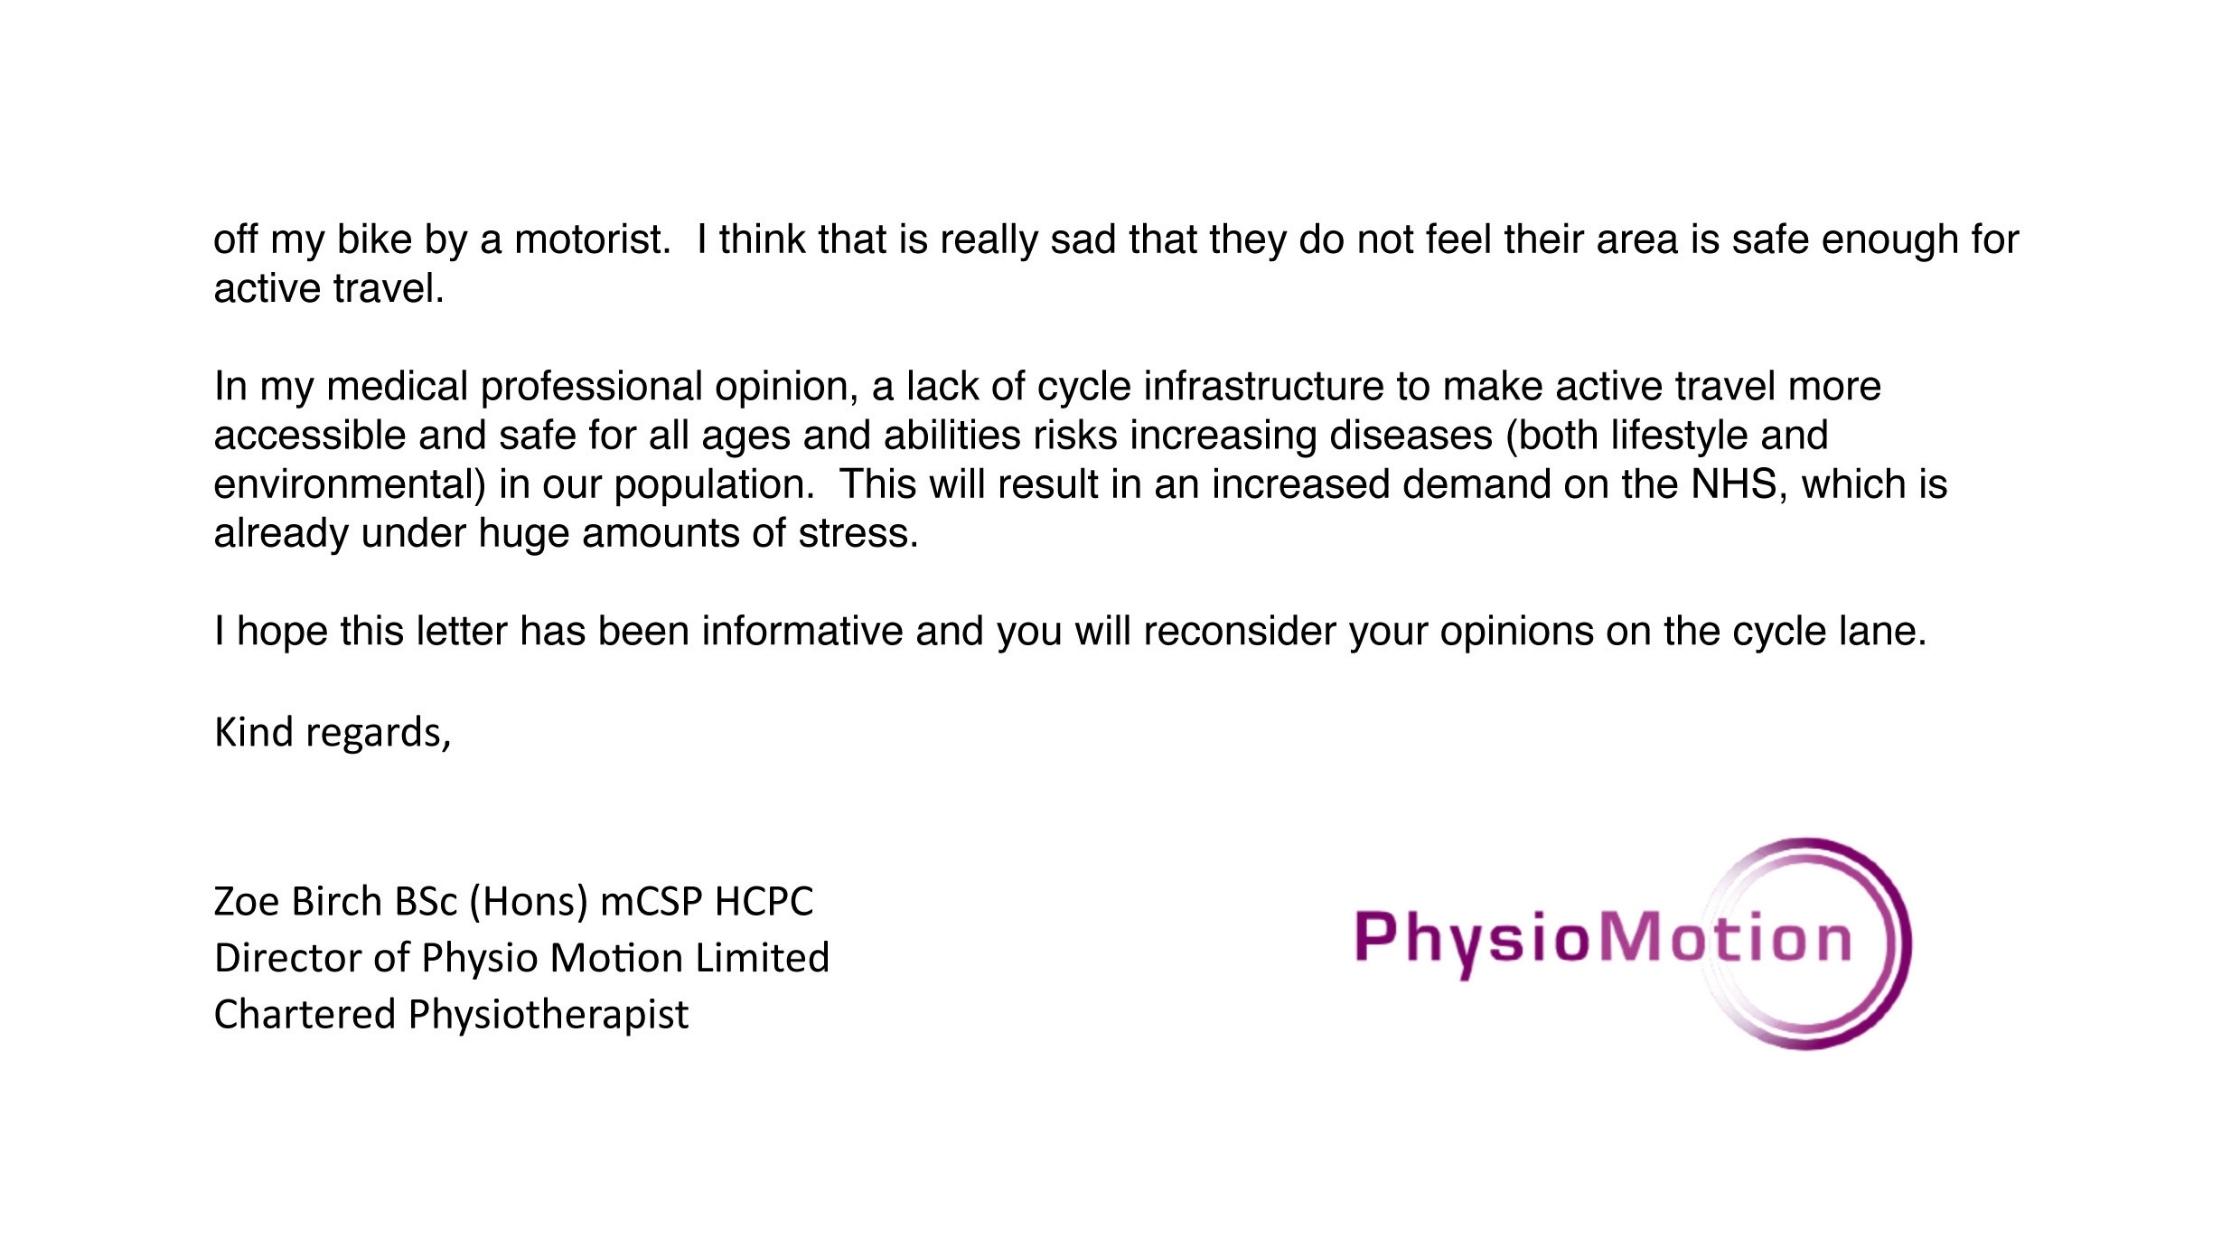 Physio Motion